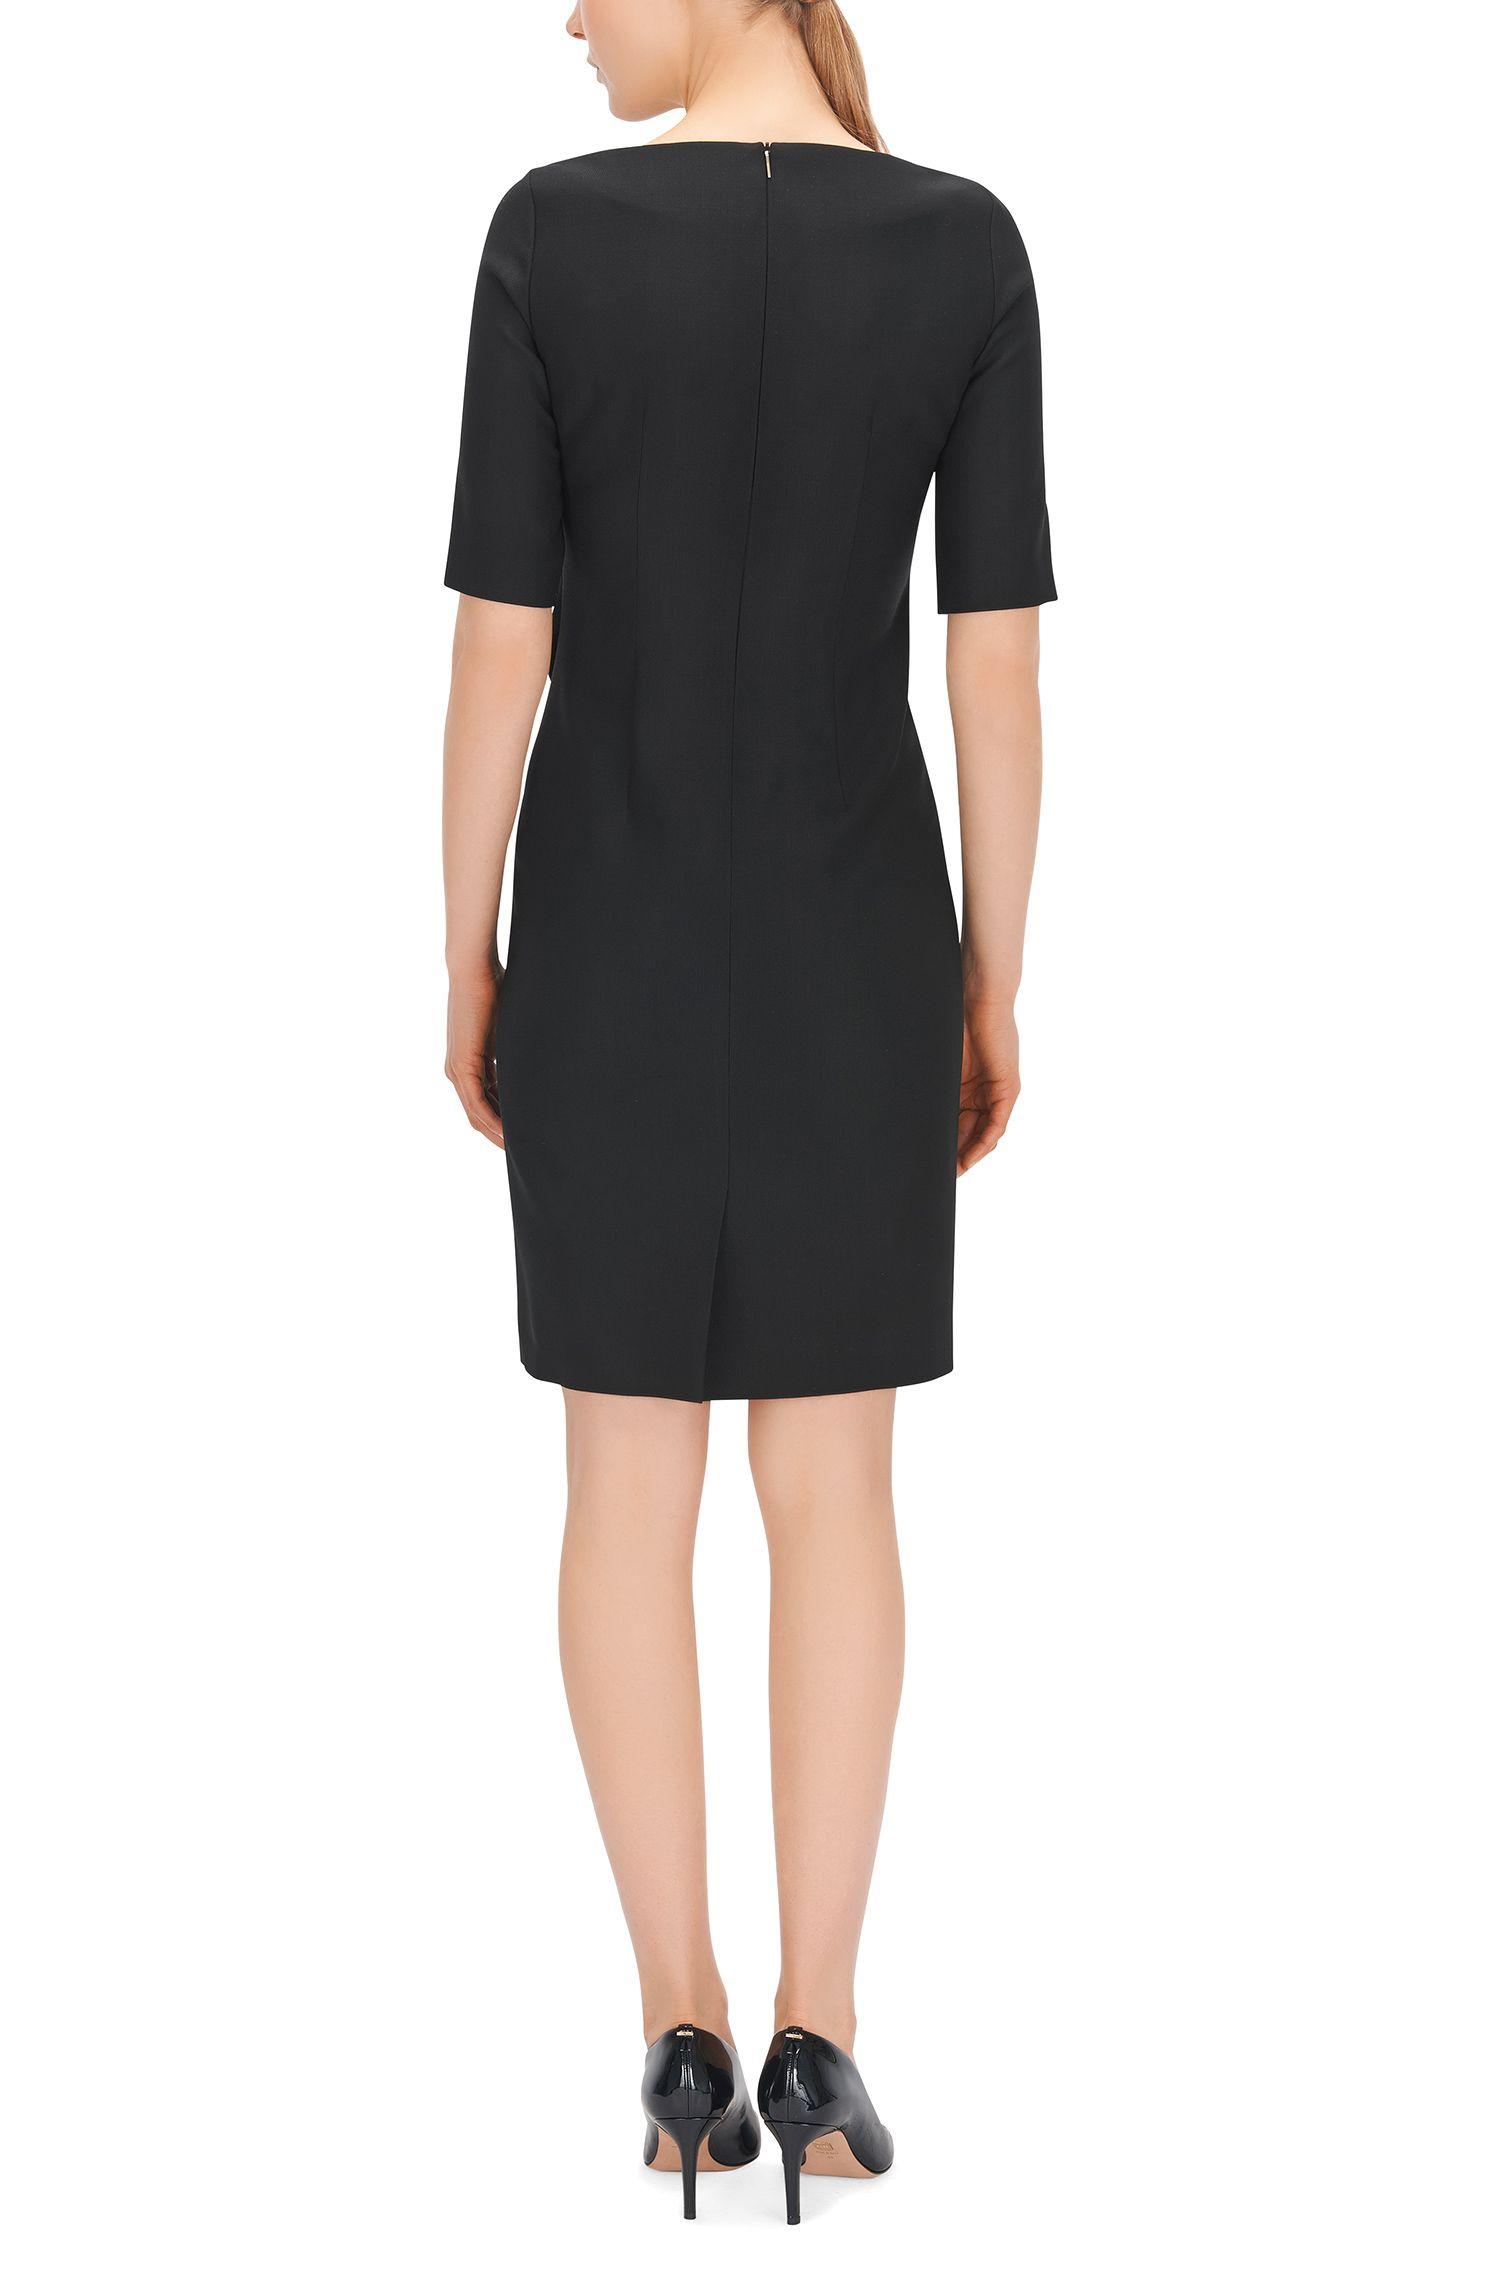 Virgin Wool Blend Asymmetrical Sheath Dress | Delera